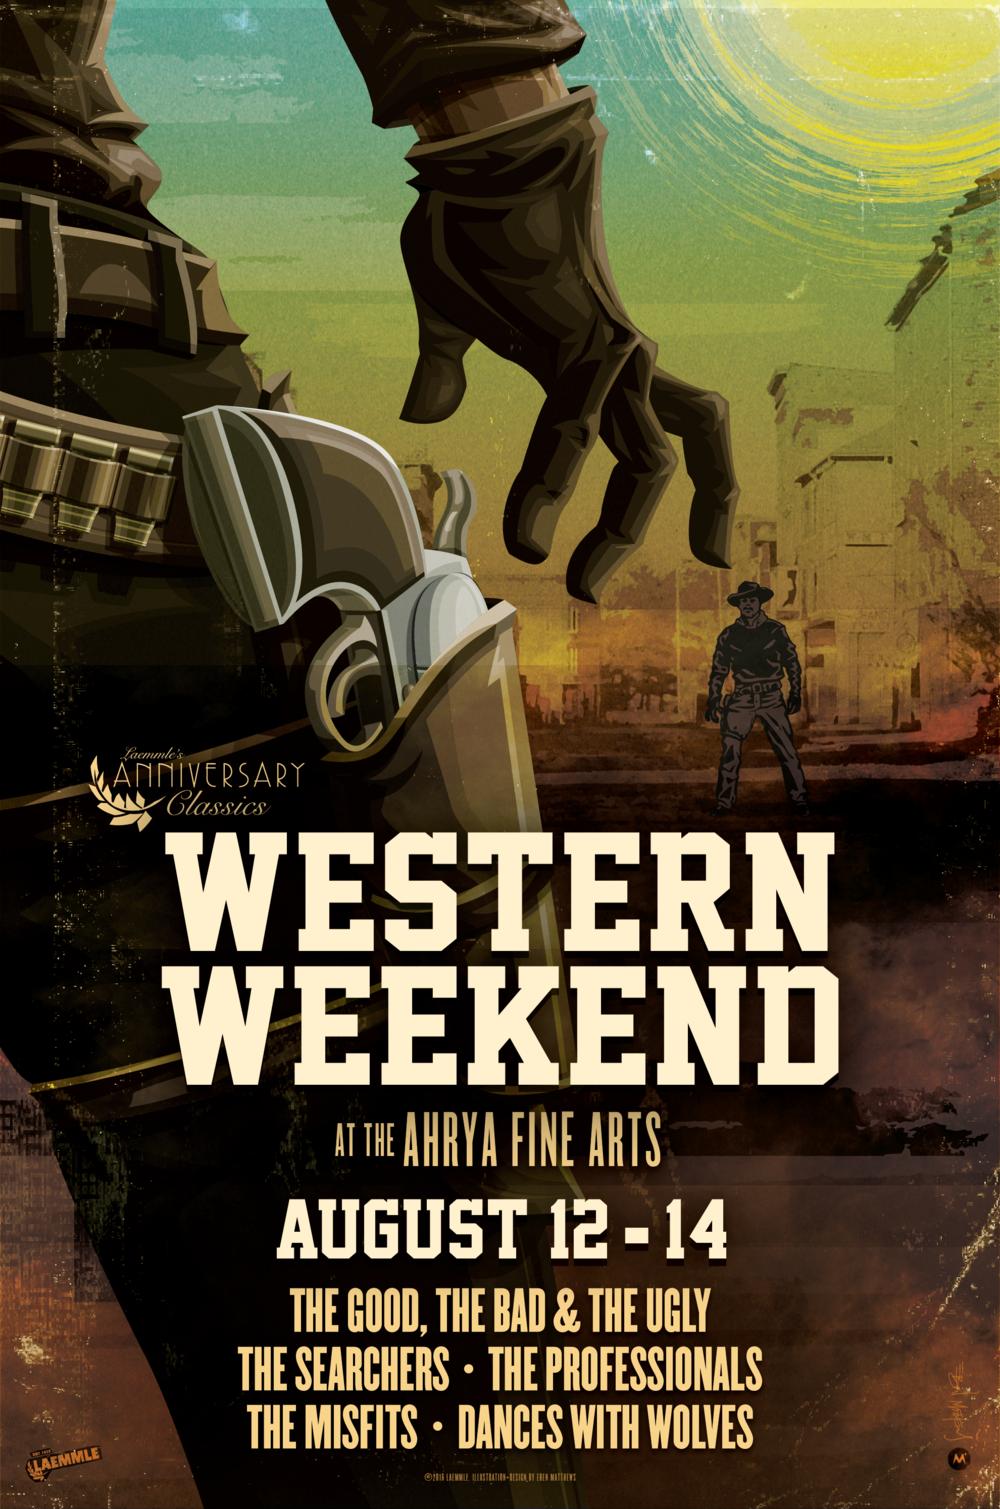 Laemmle_WesternWeekend_Poster.png